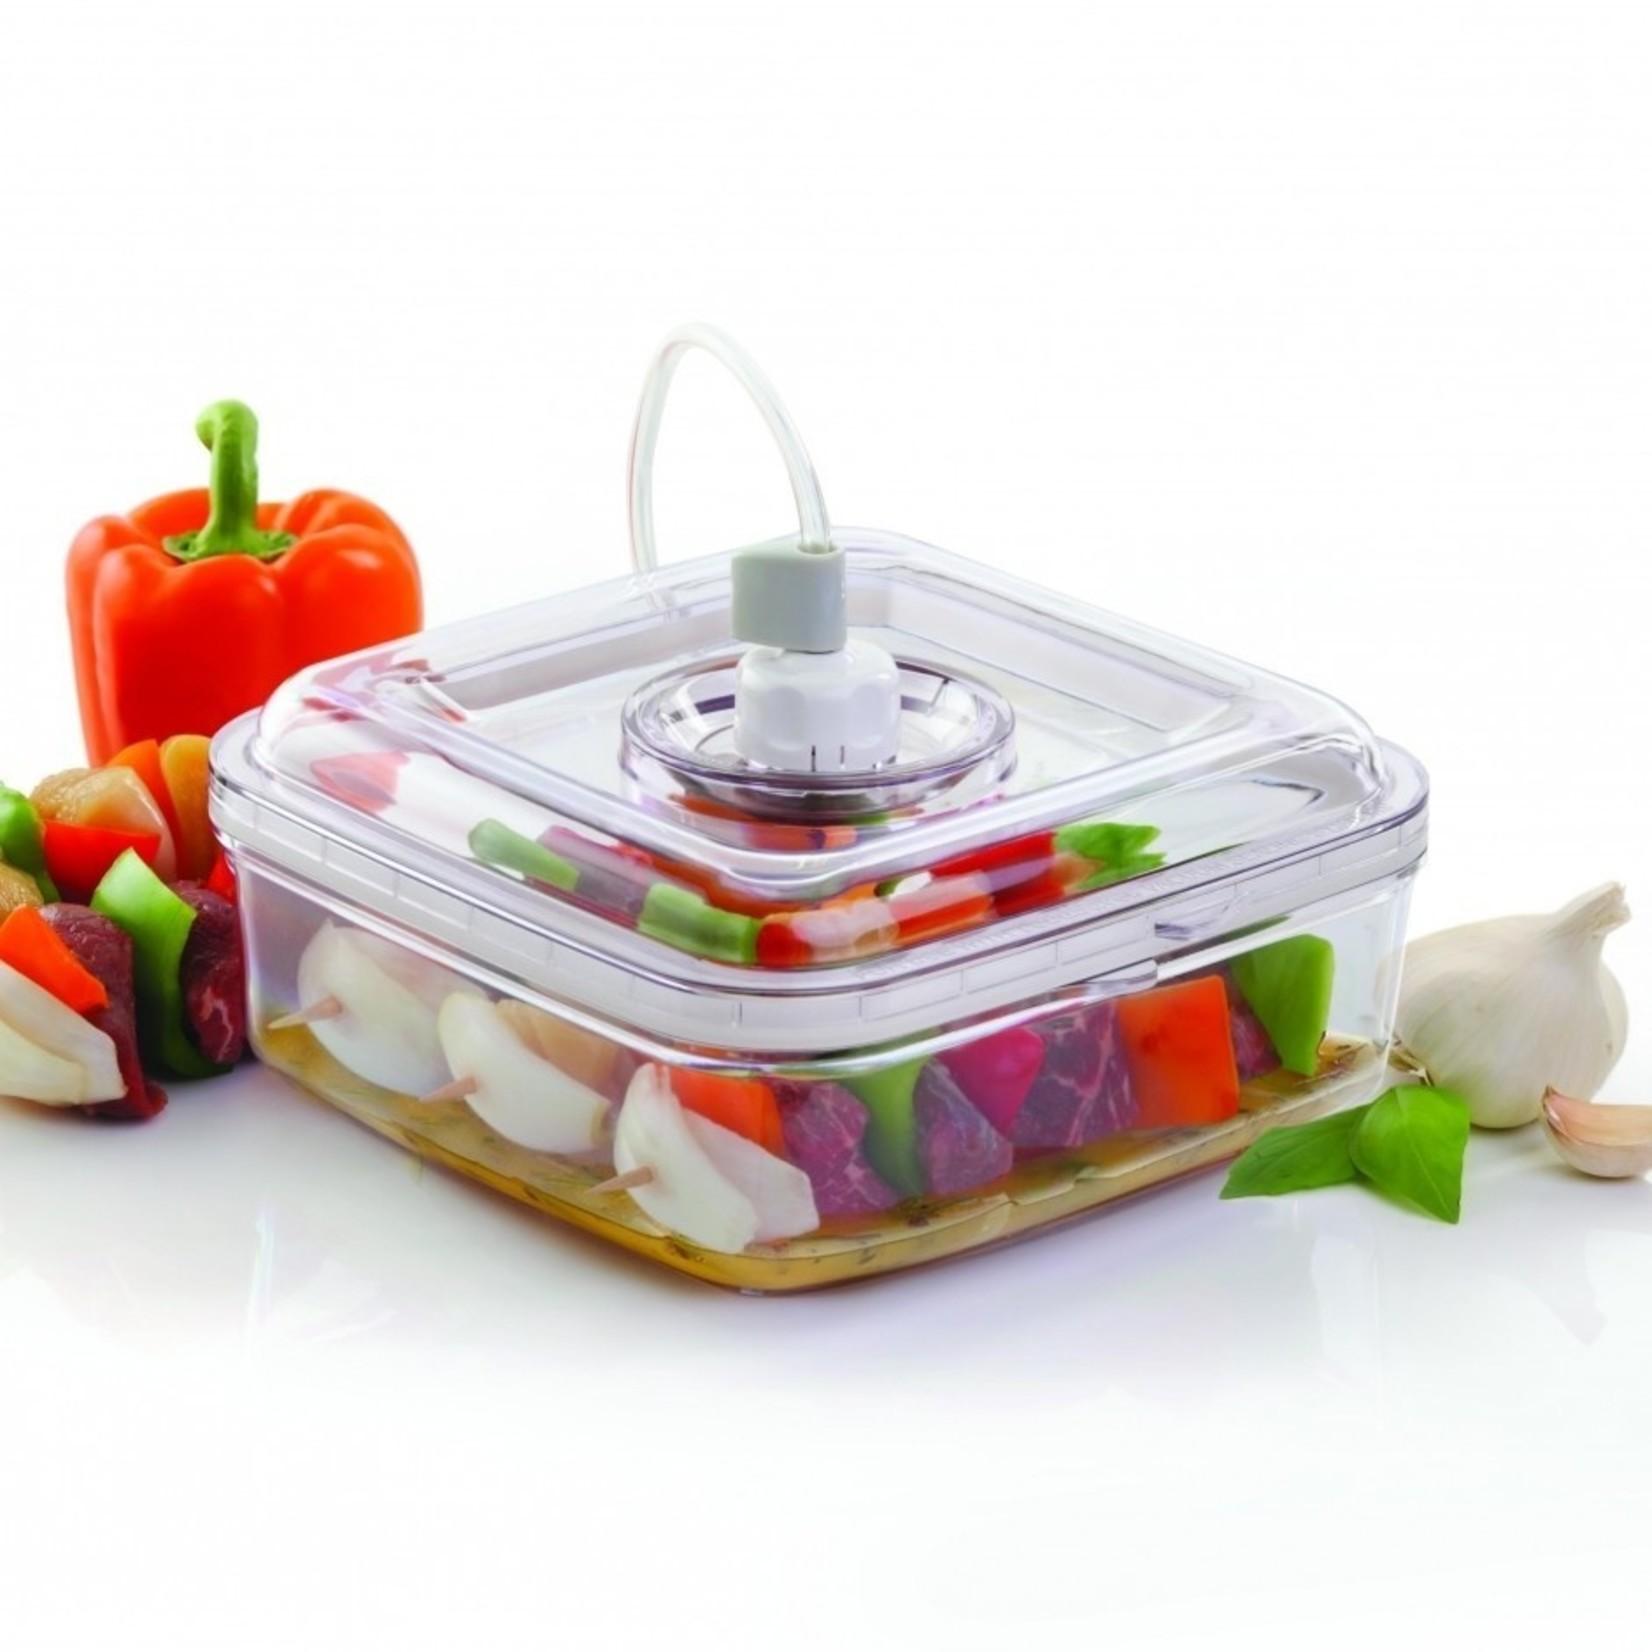 Foodsaver Foodsaver Vershouddzozen Marinadebox